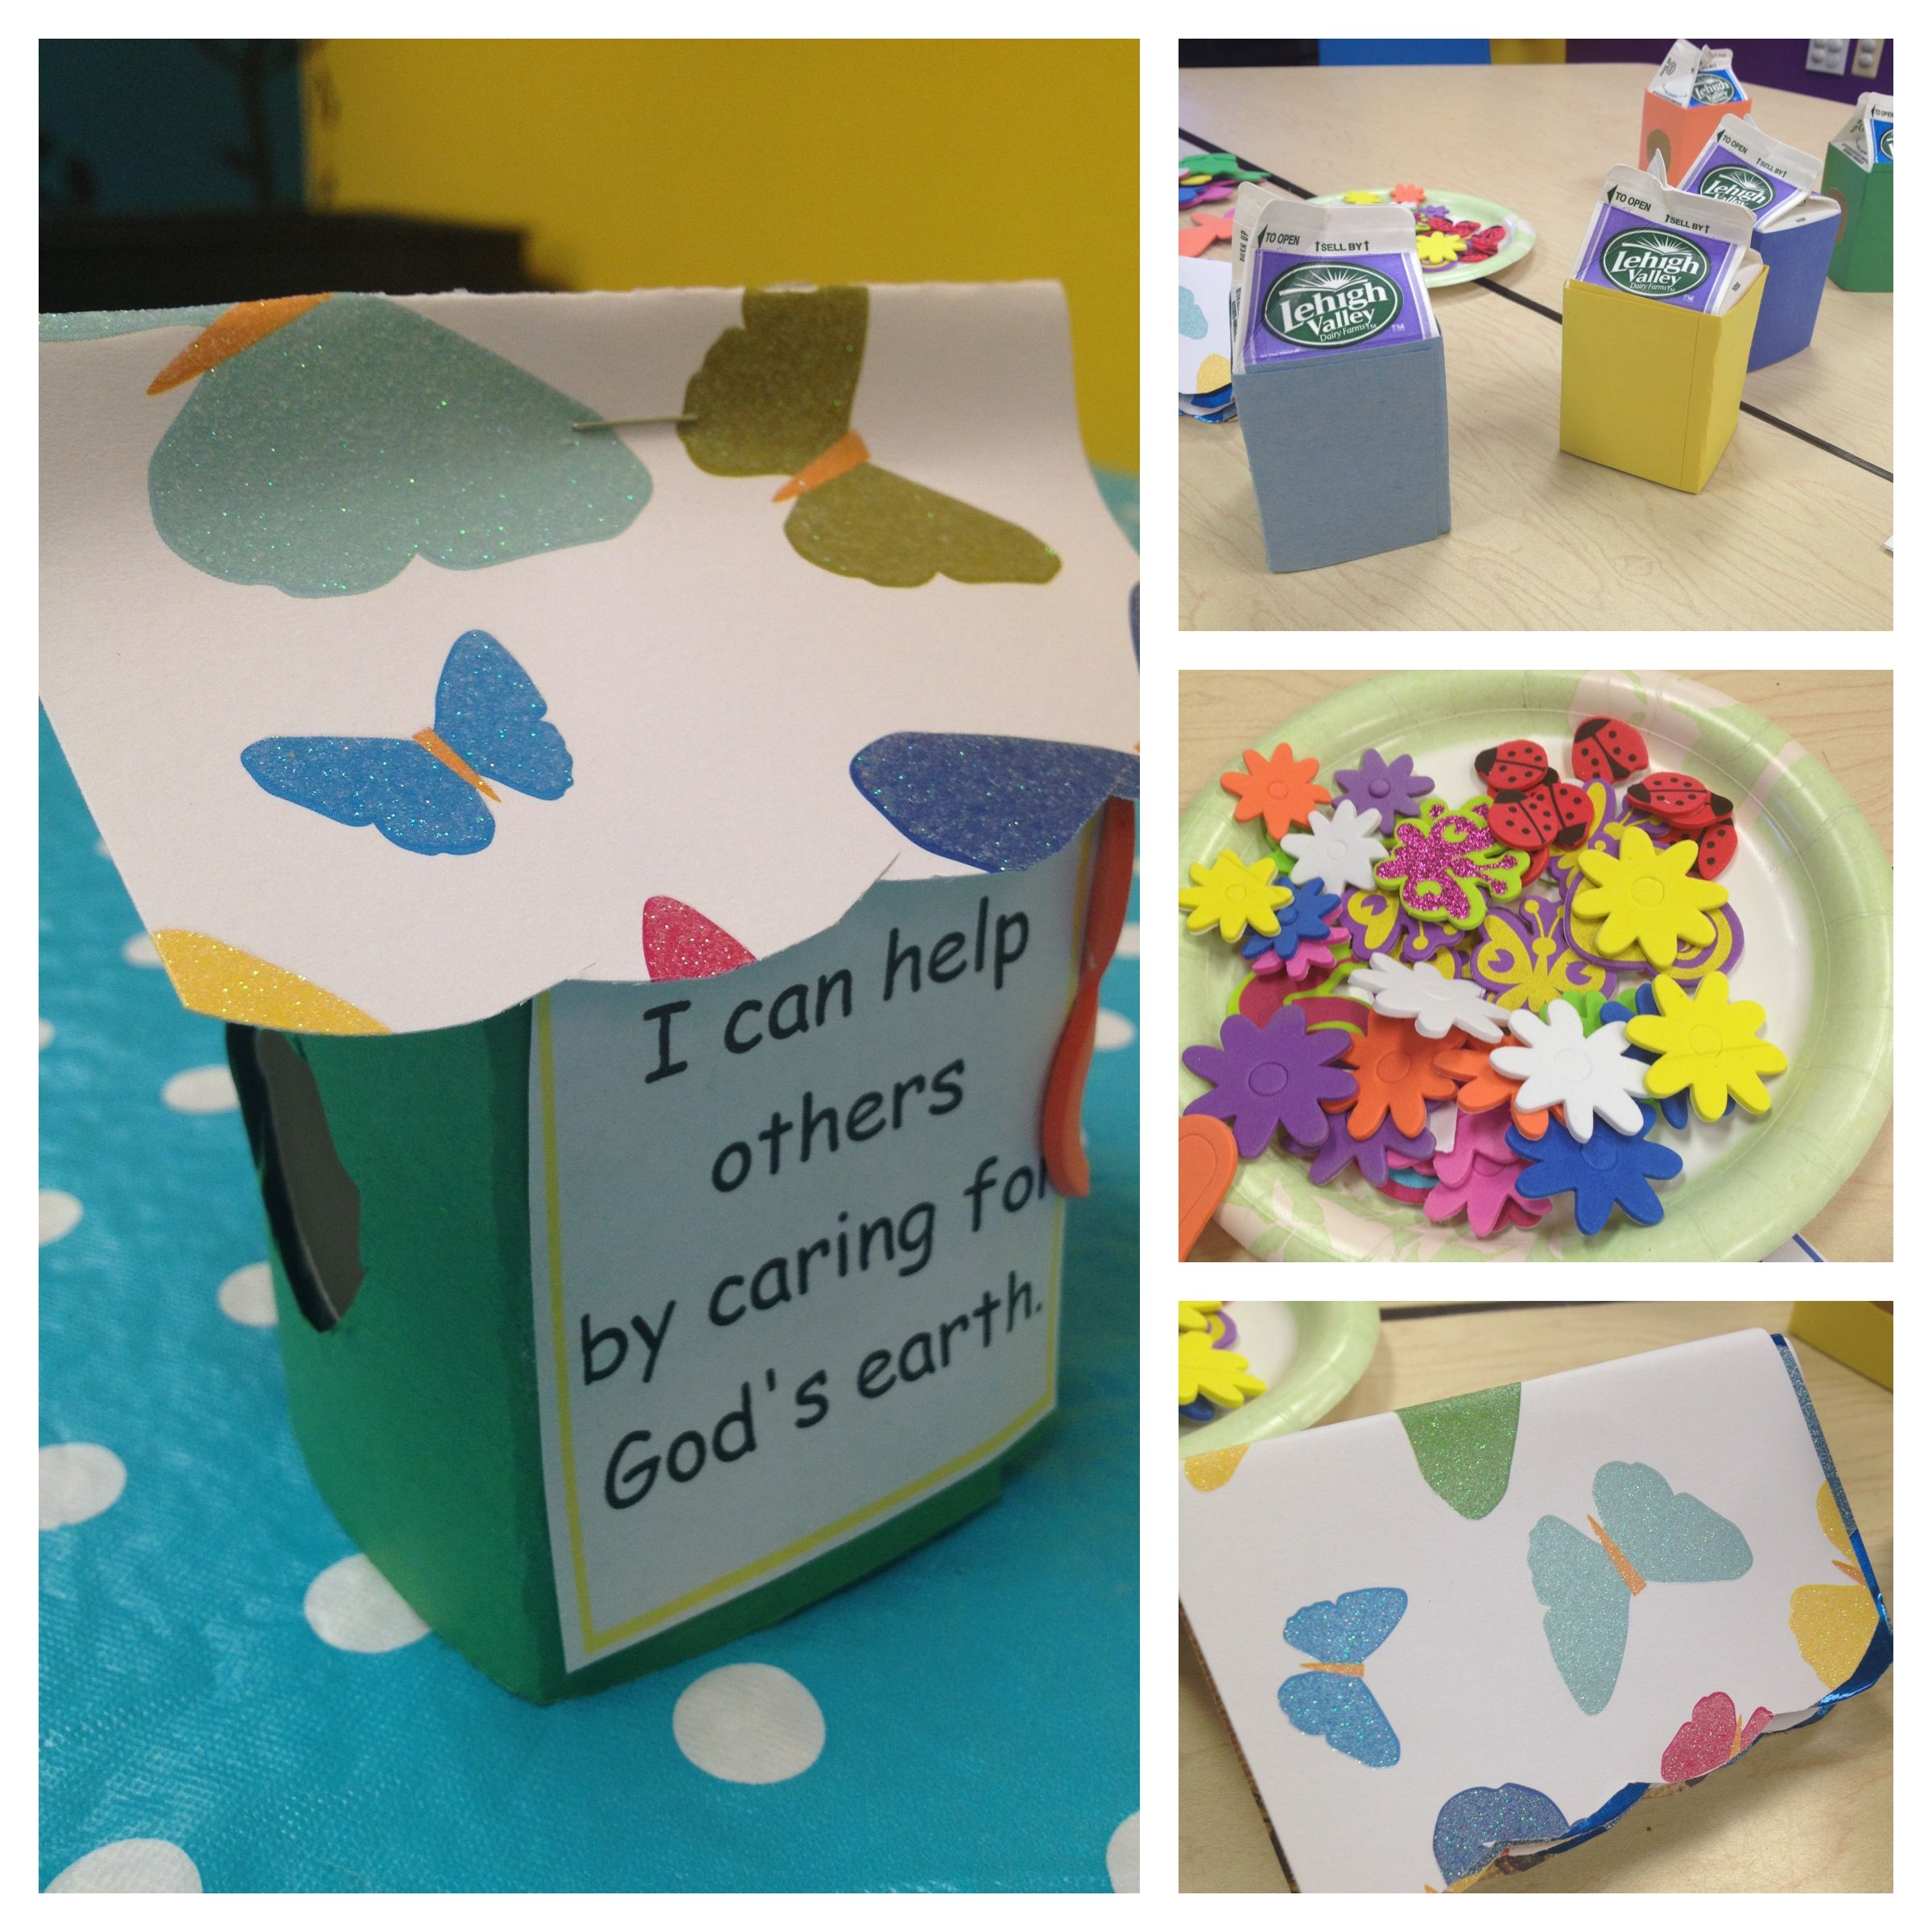 Kids Church Craft Birdhouse With Milk Carton Construction